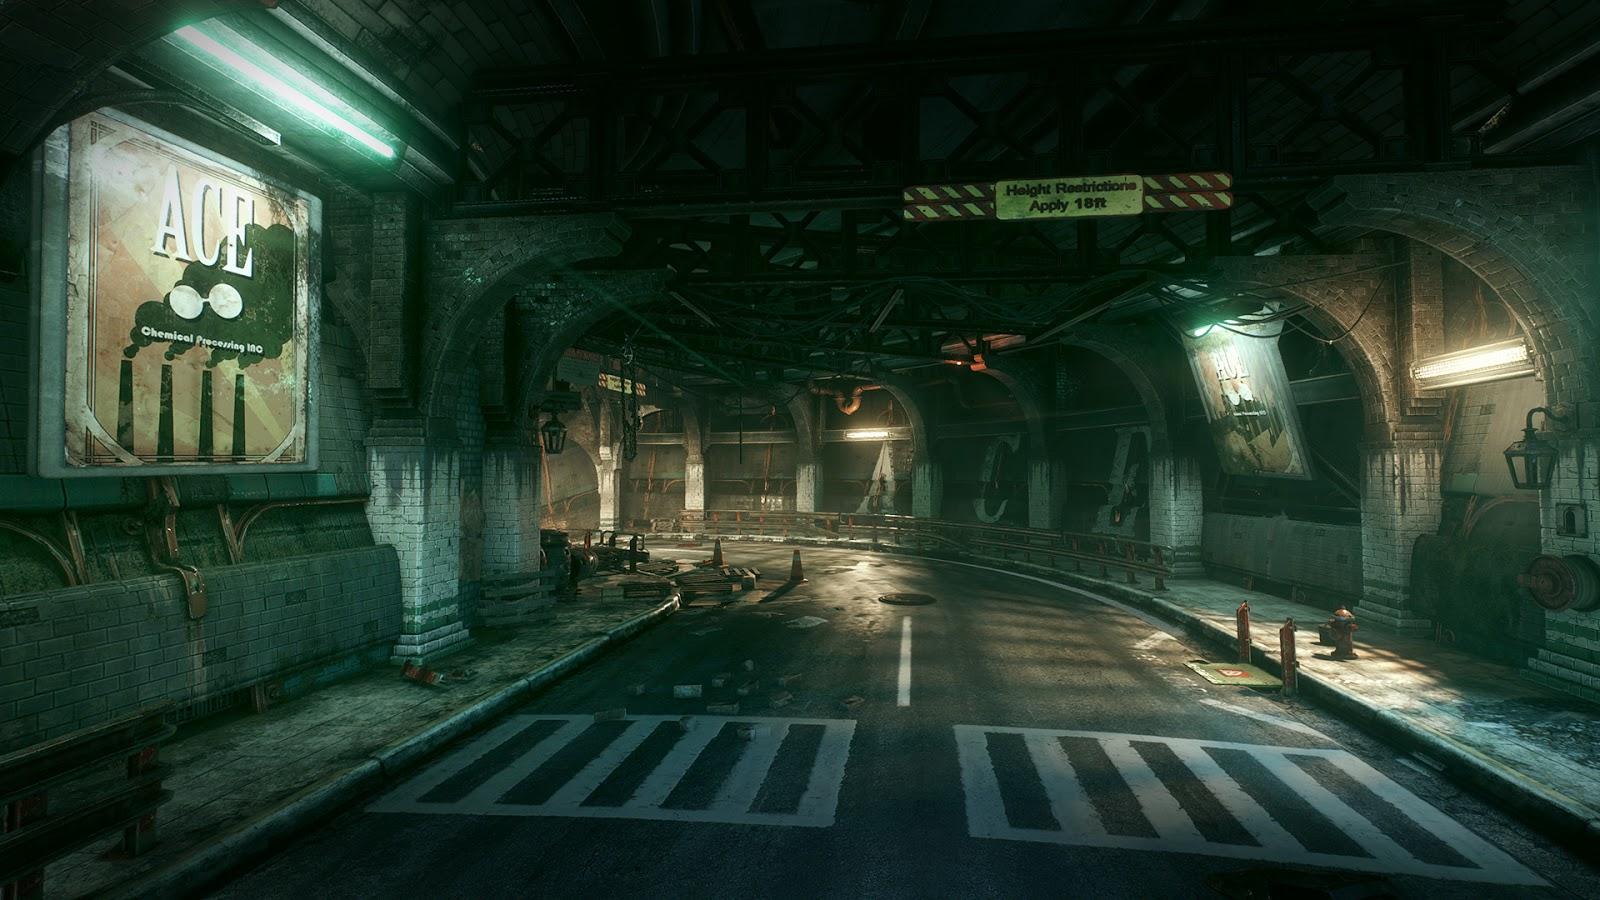 Batman Arkham Knight Environments in Unreal  CG Daily News